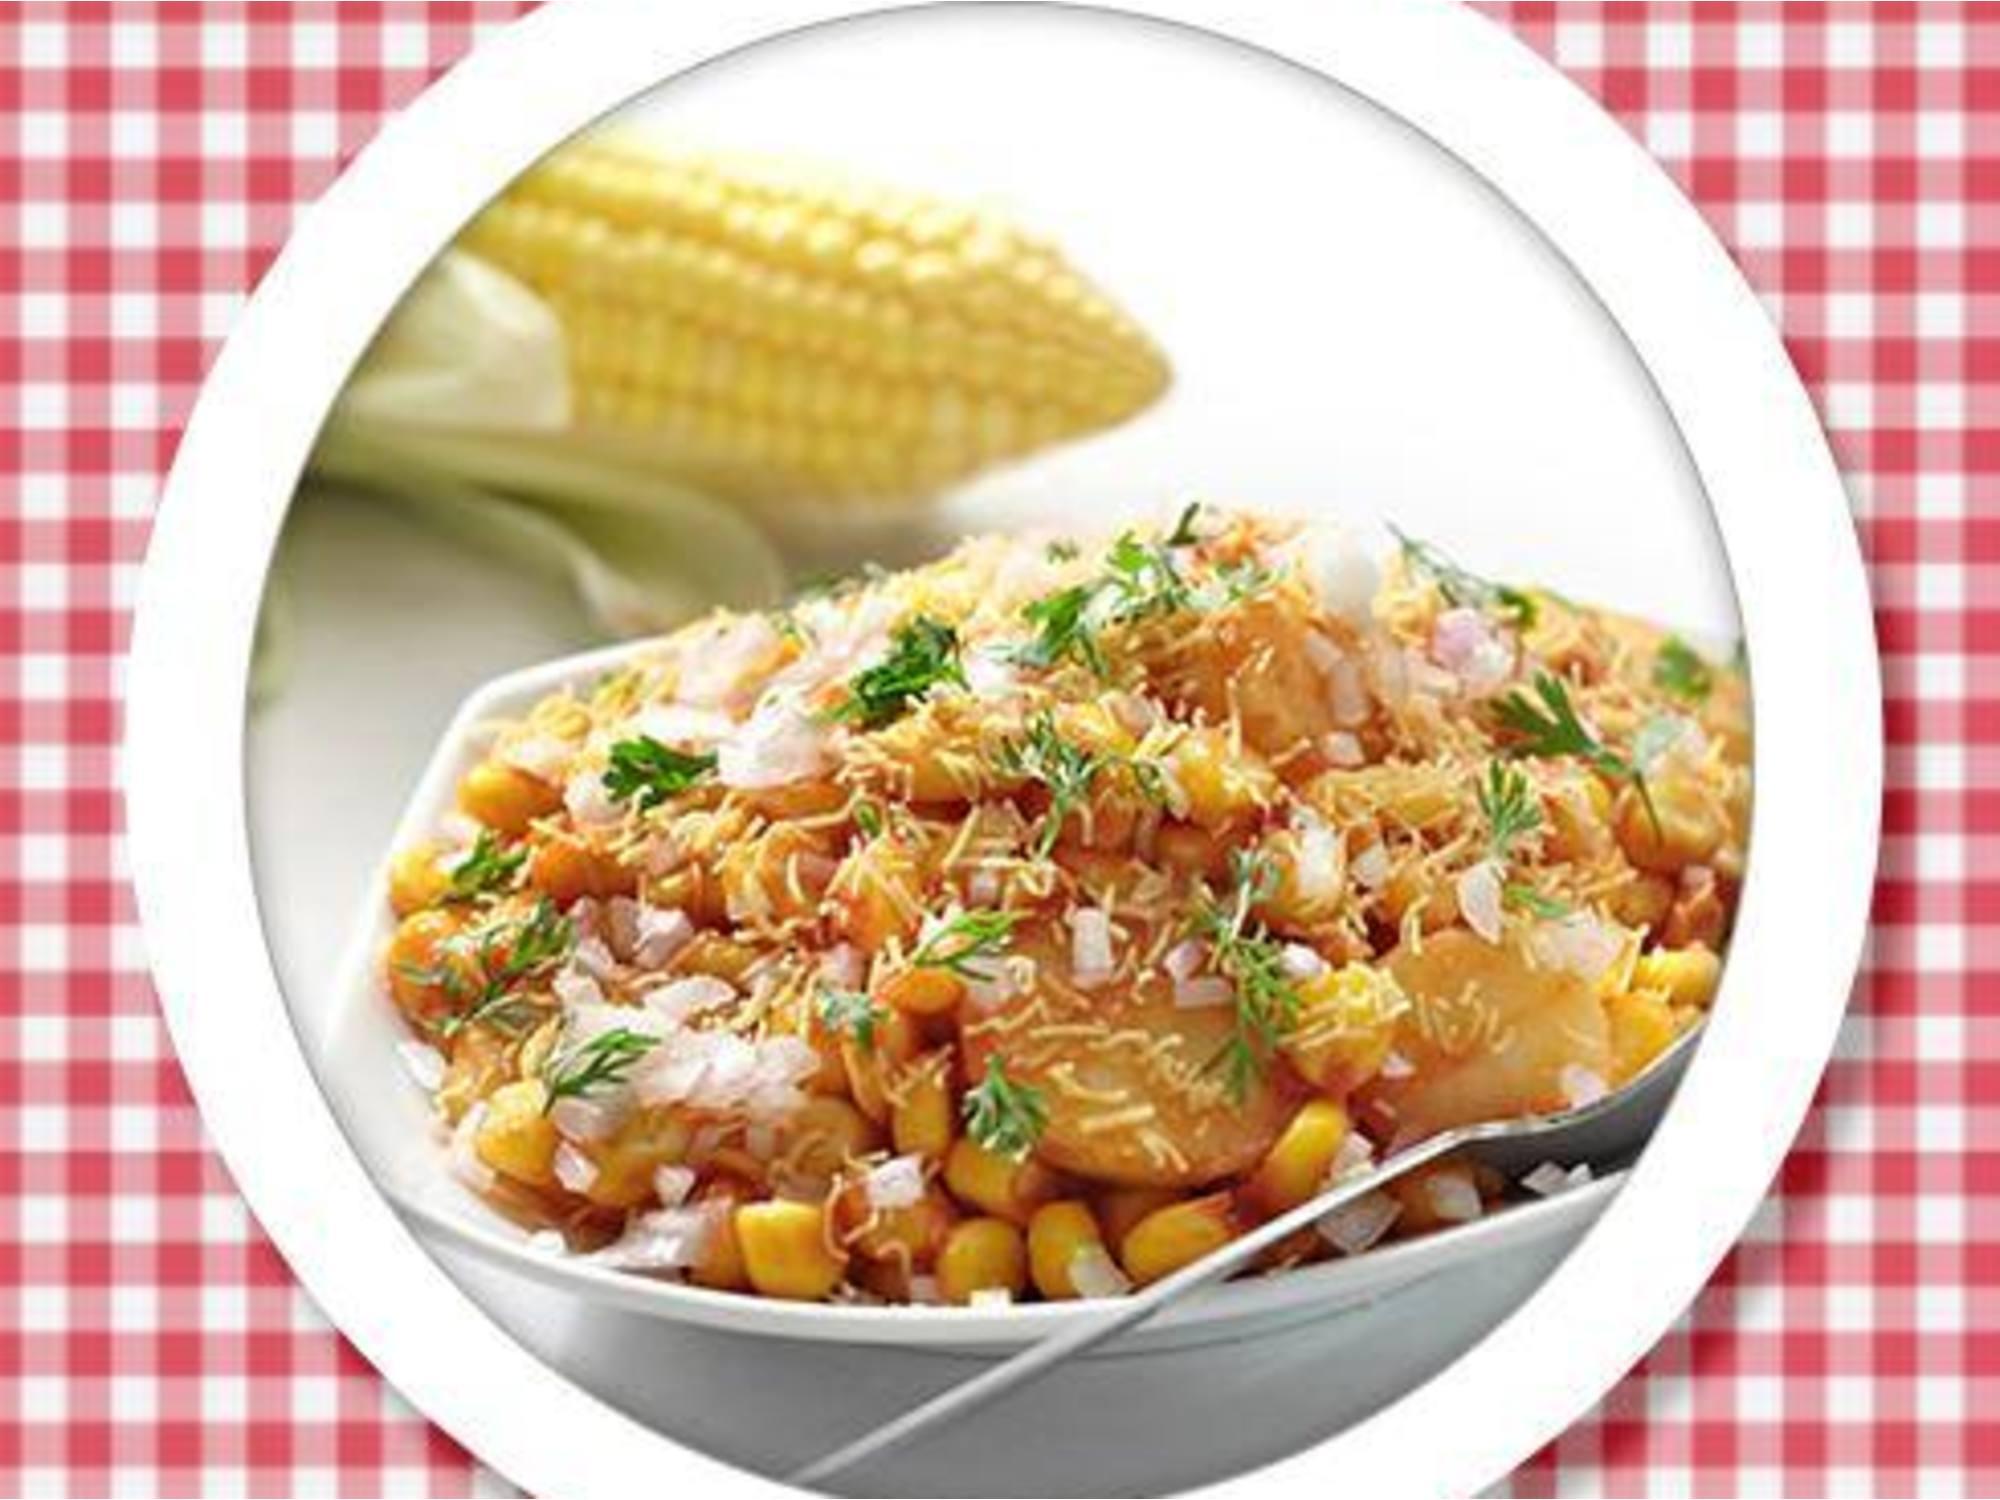 Recipe of Sweet & Spicy Corn Bhel